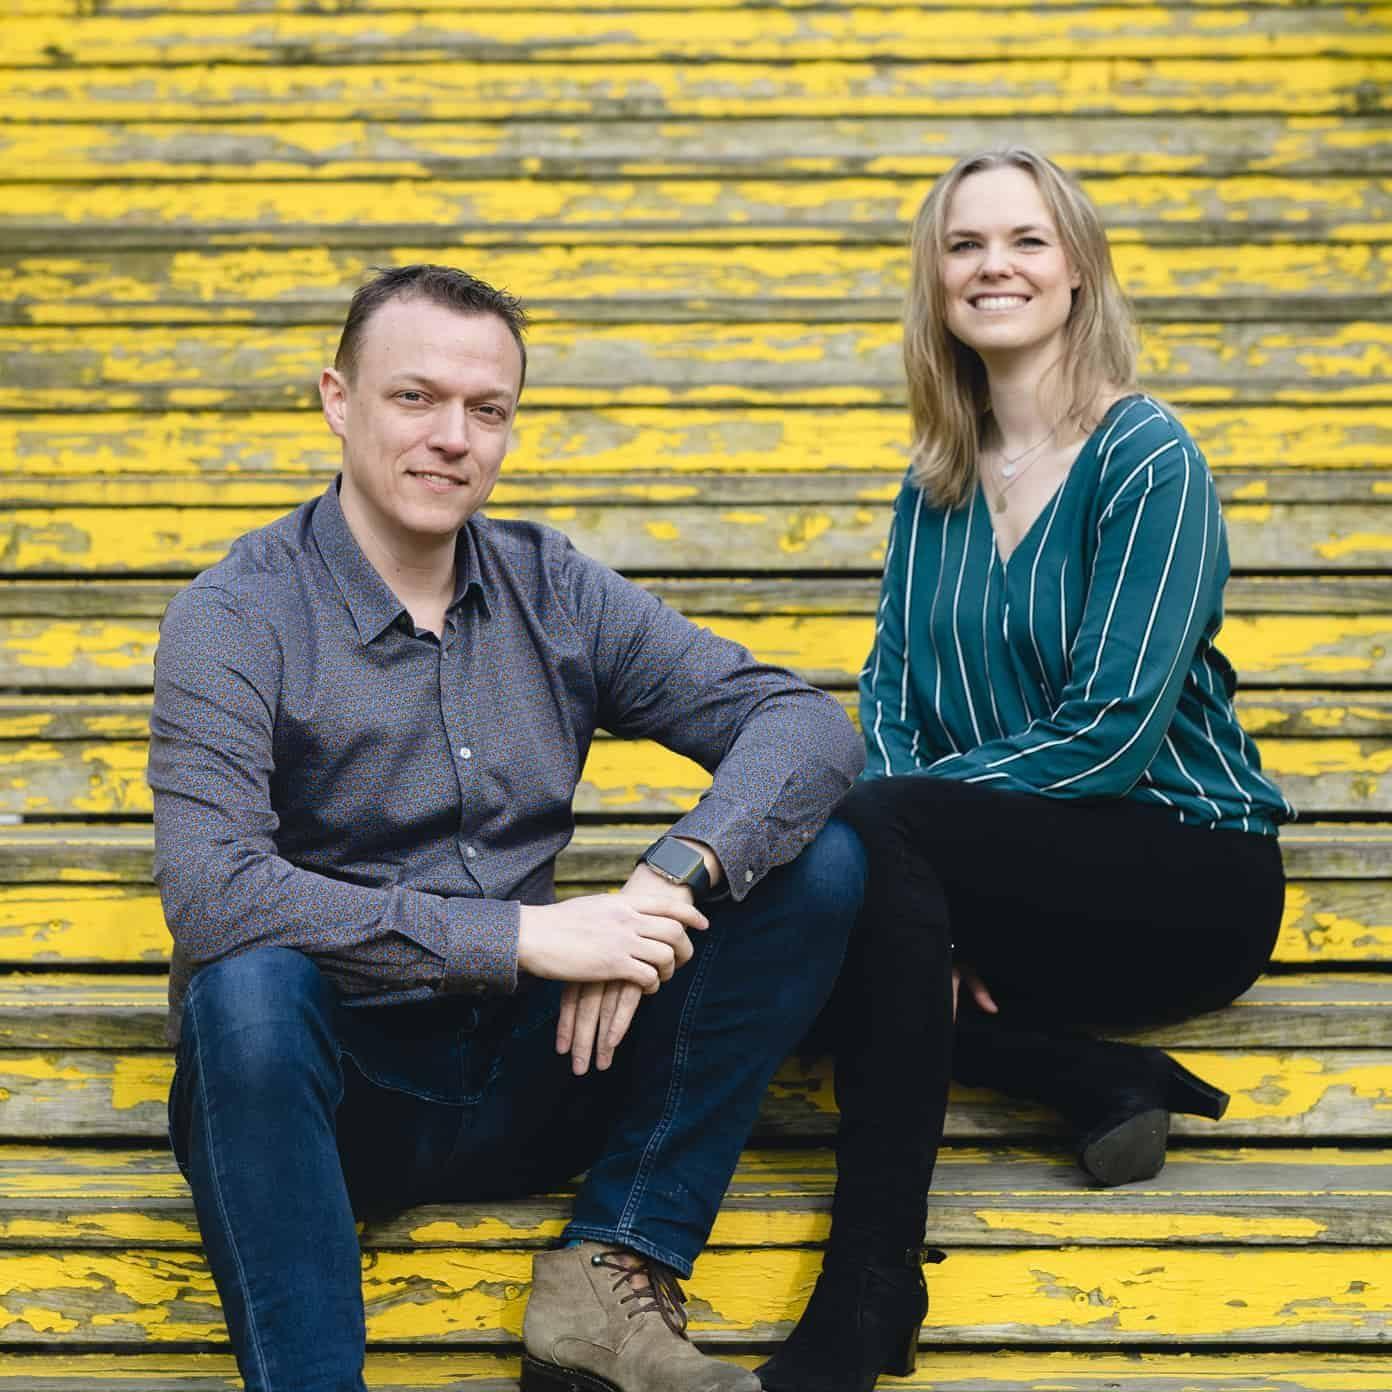 Portret foto Arnoud & Mirjam